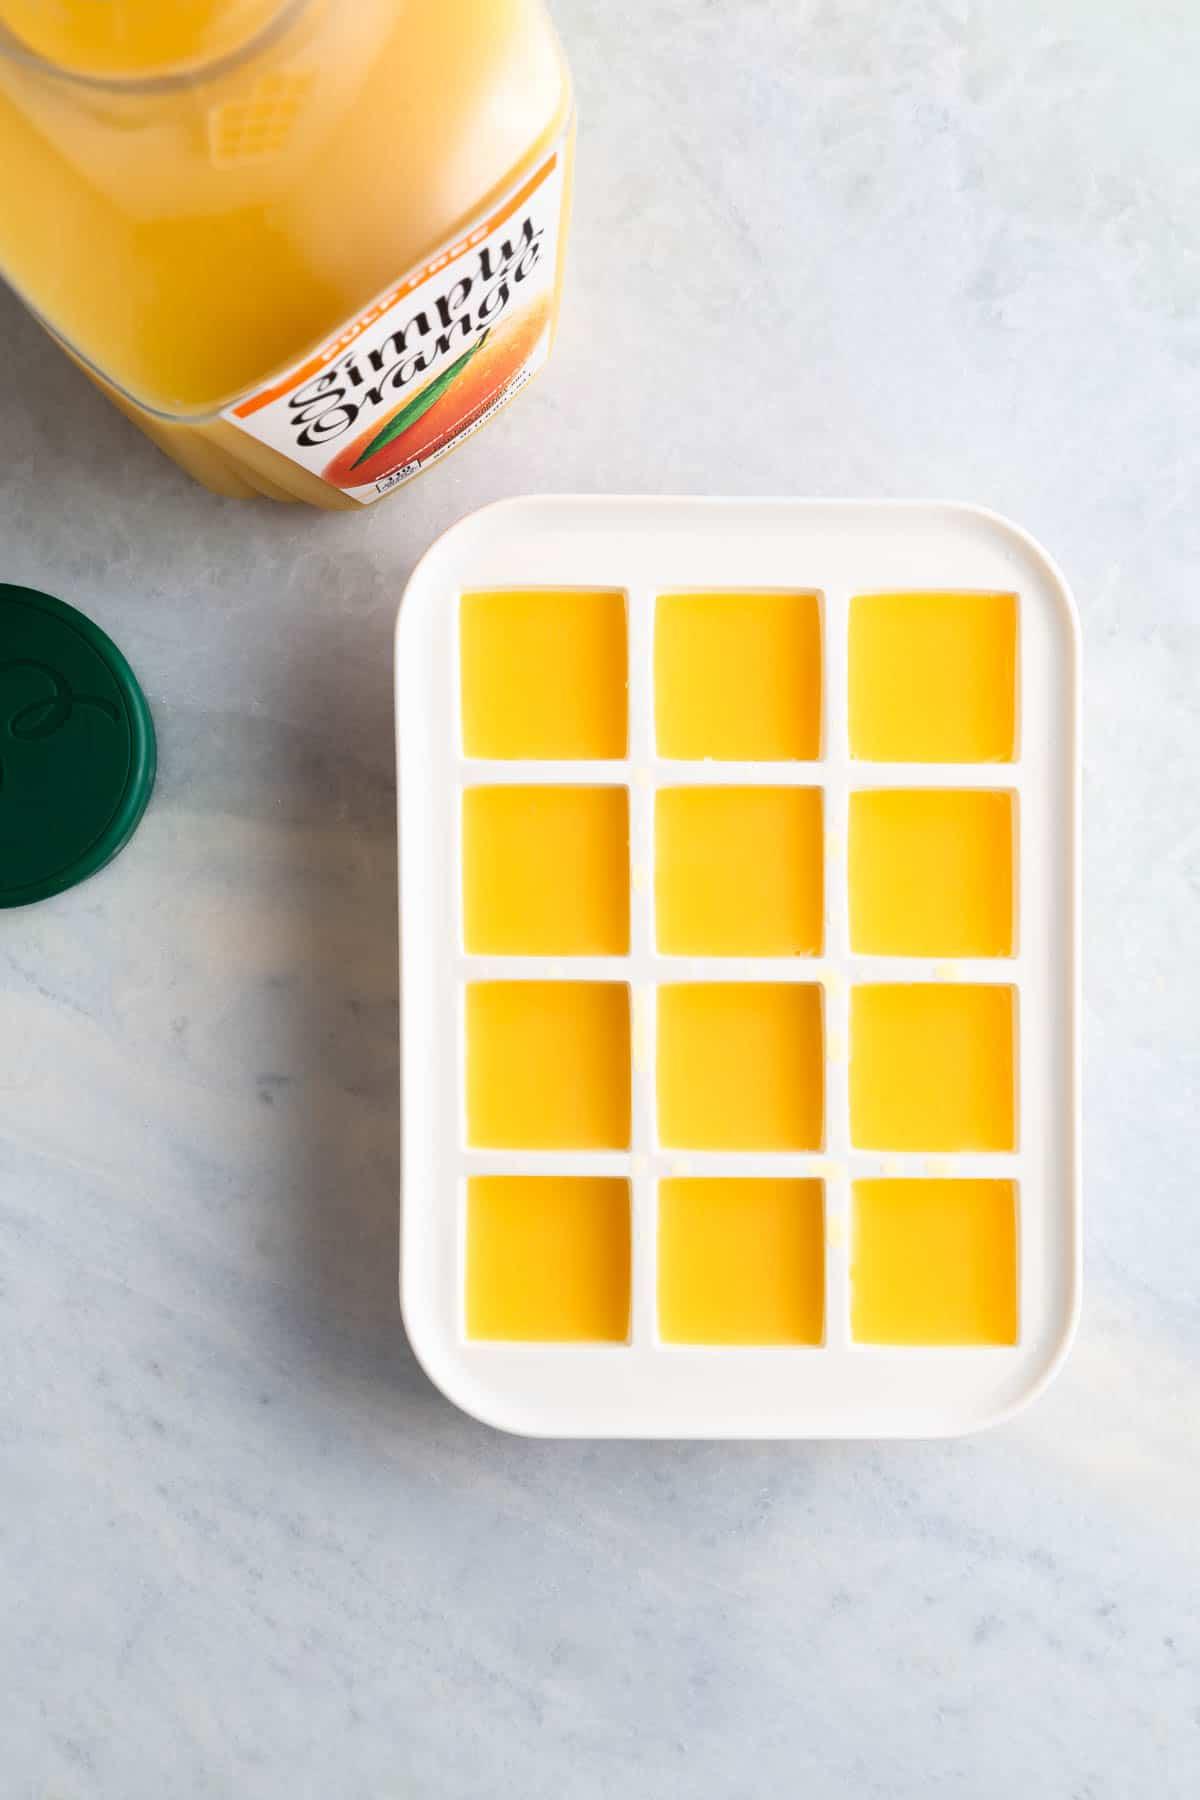 frozen orange juice in a white ice cube tray next to a bottle of orange juice